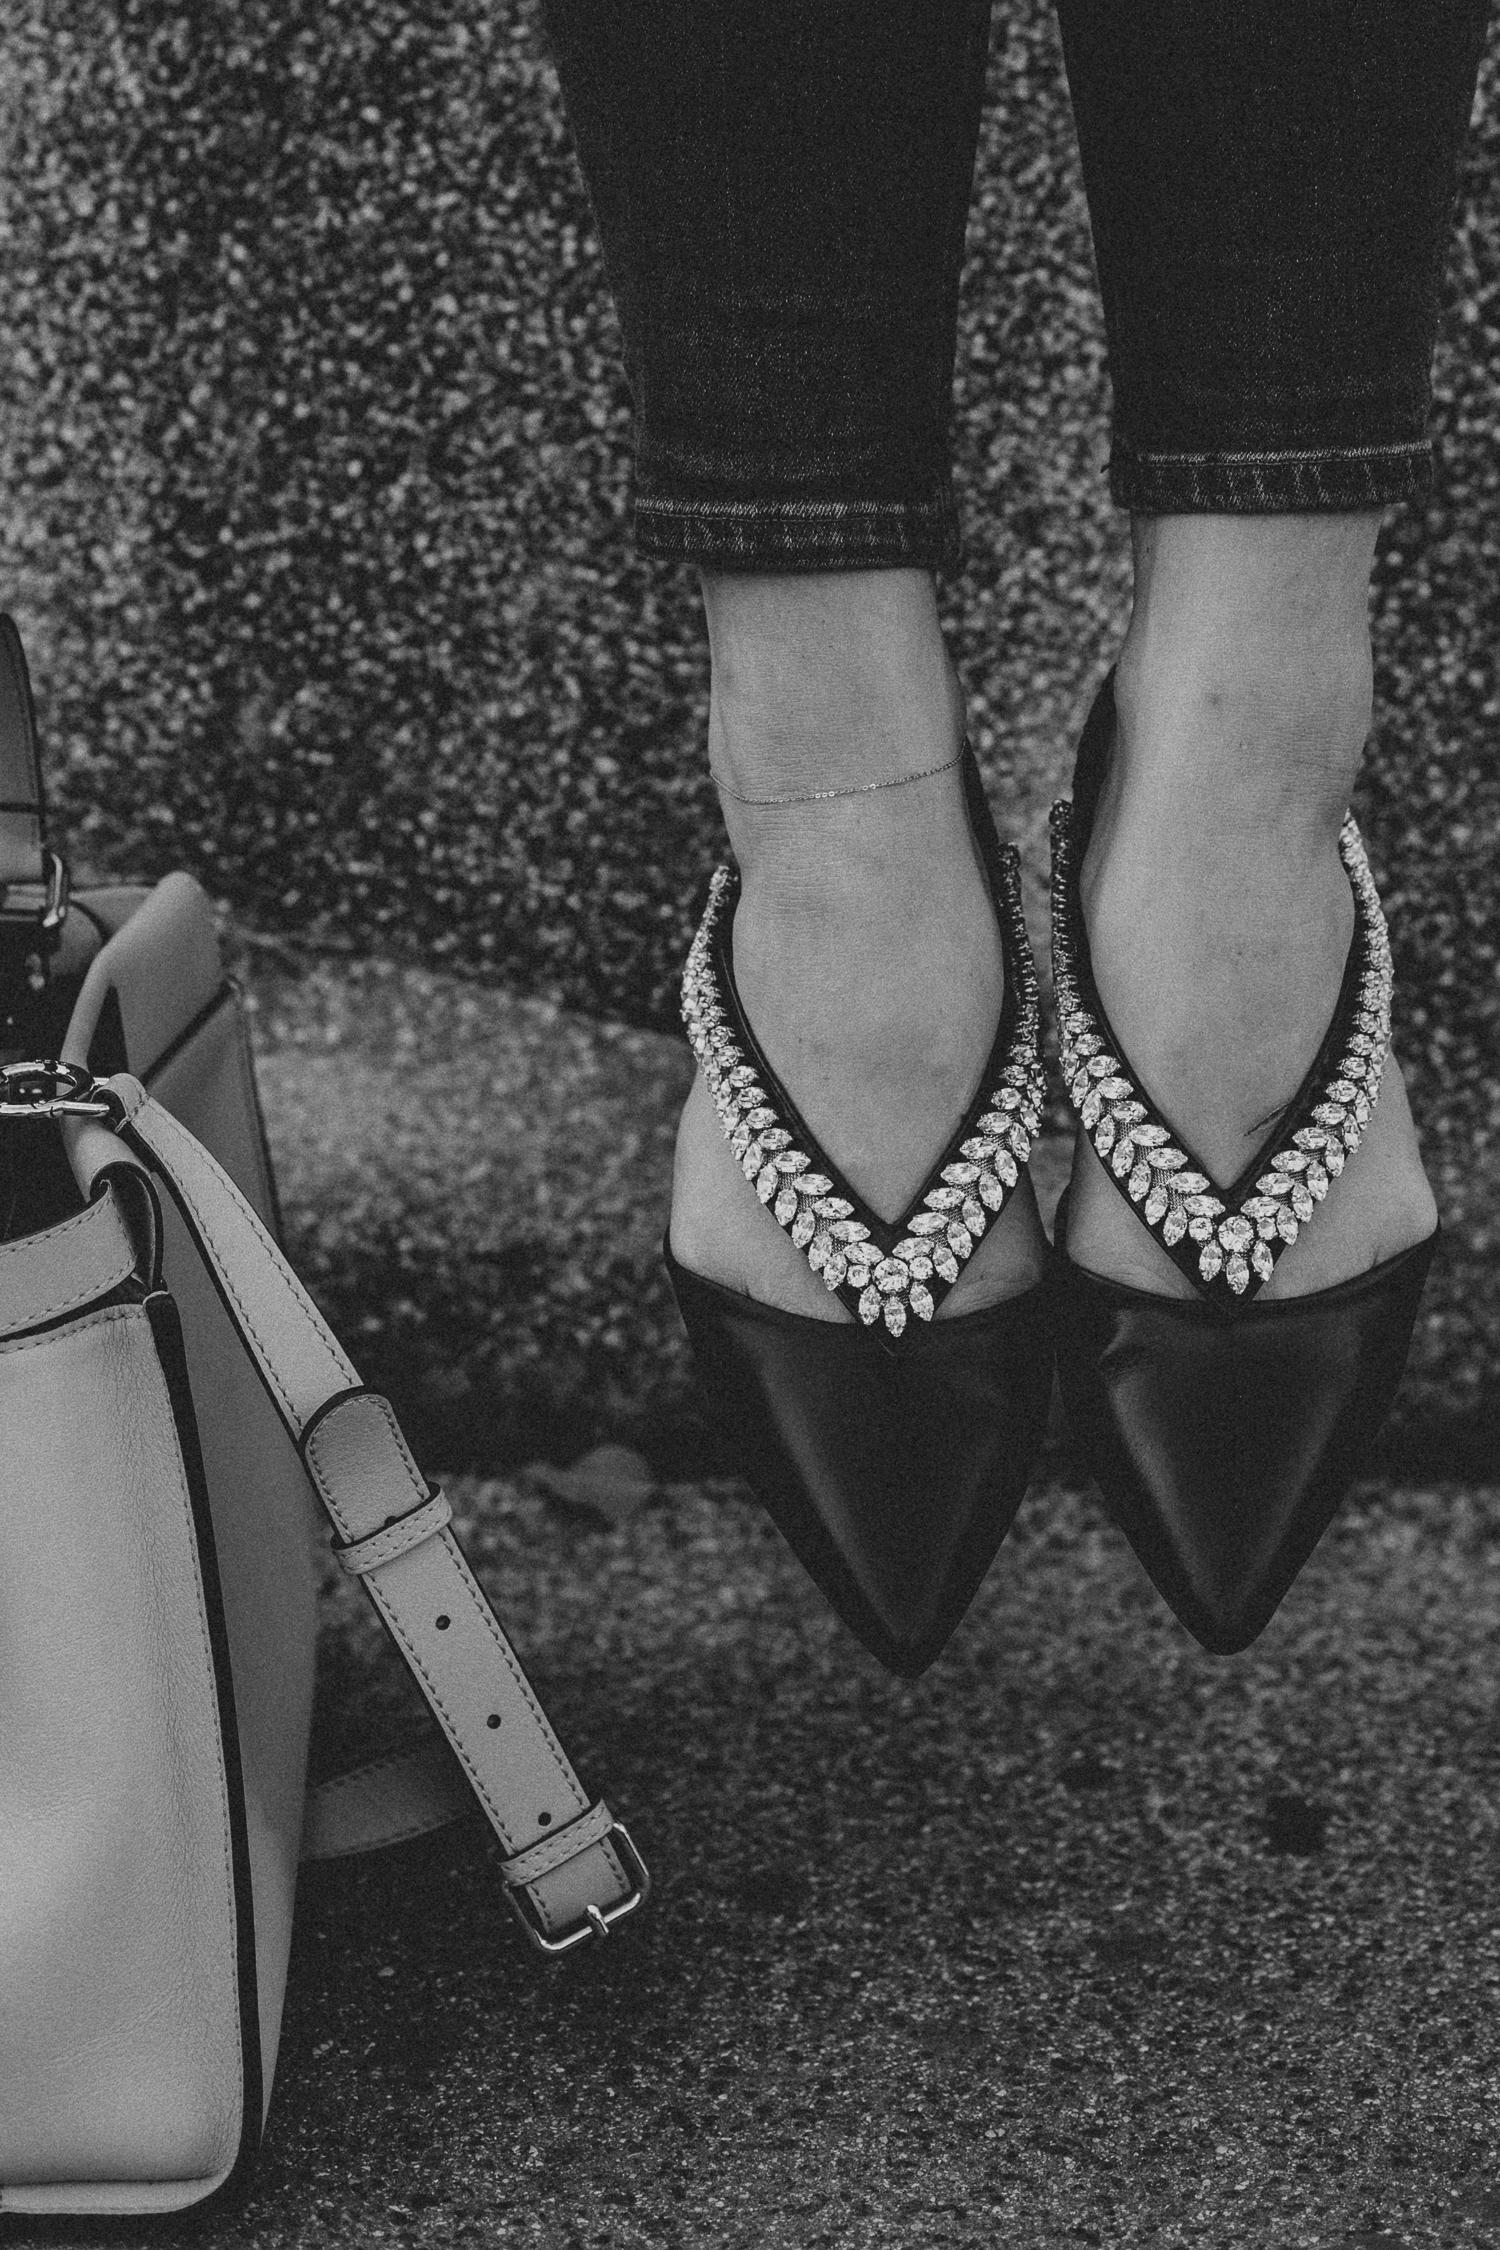 Roger Vivier Flats, Fendi Peekaboo bag | Bikinis & Passports